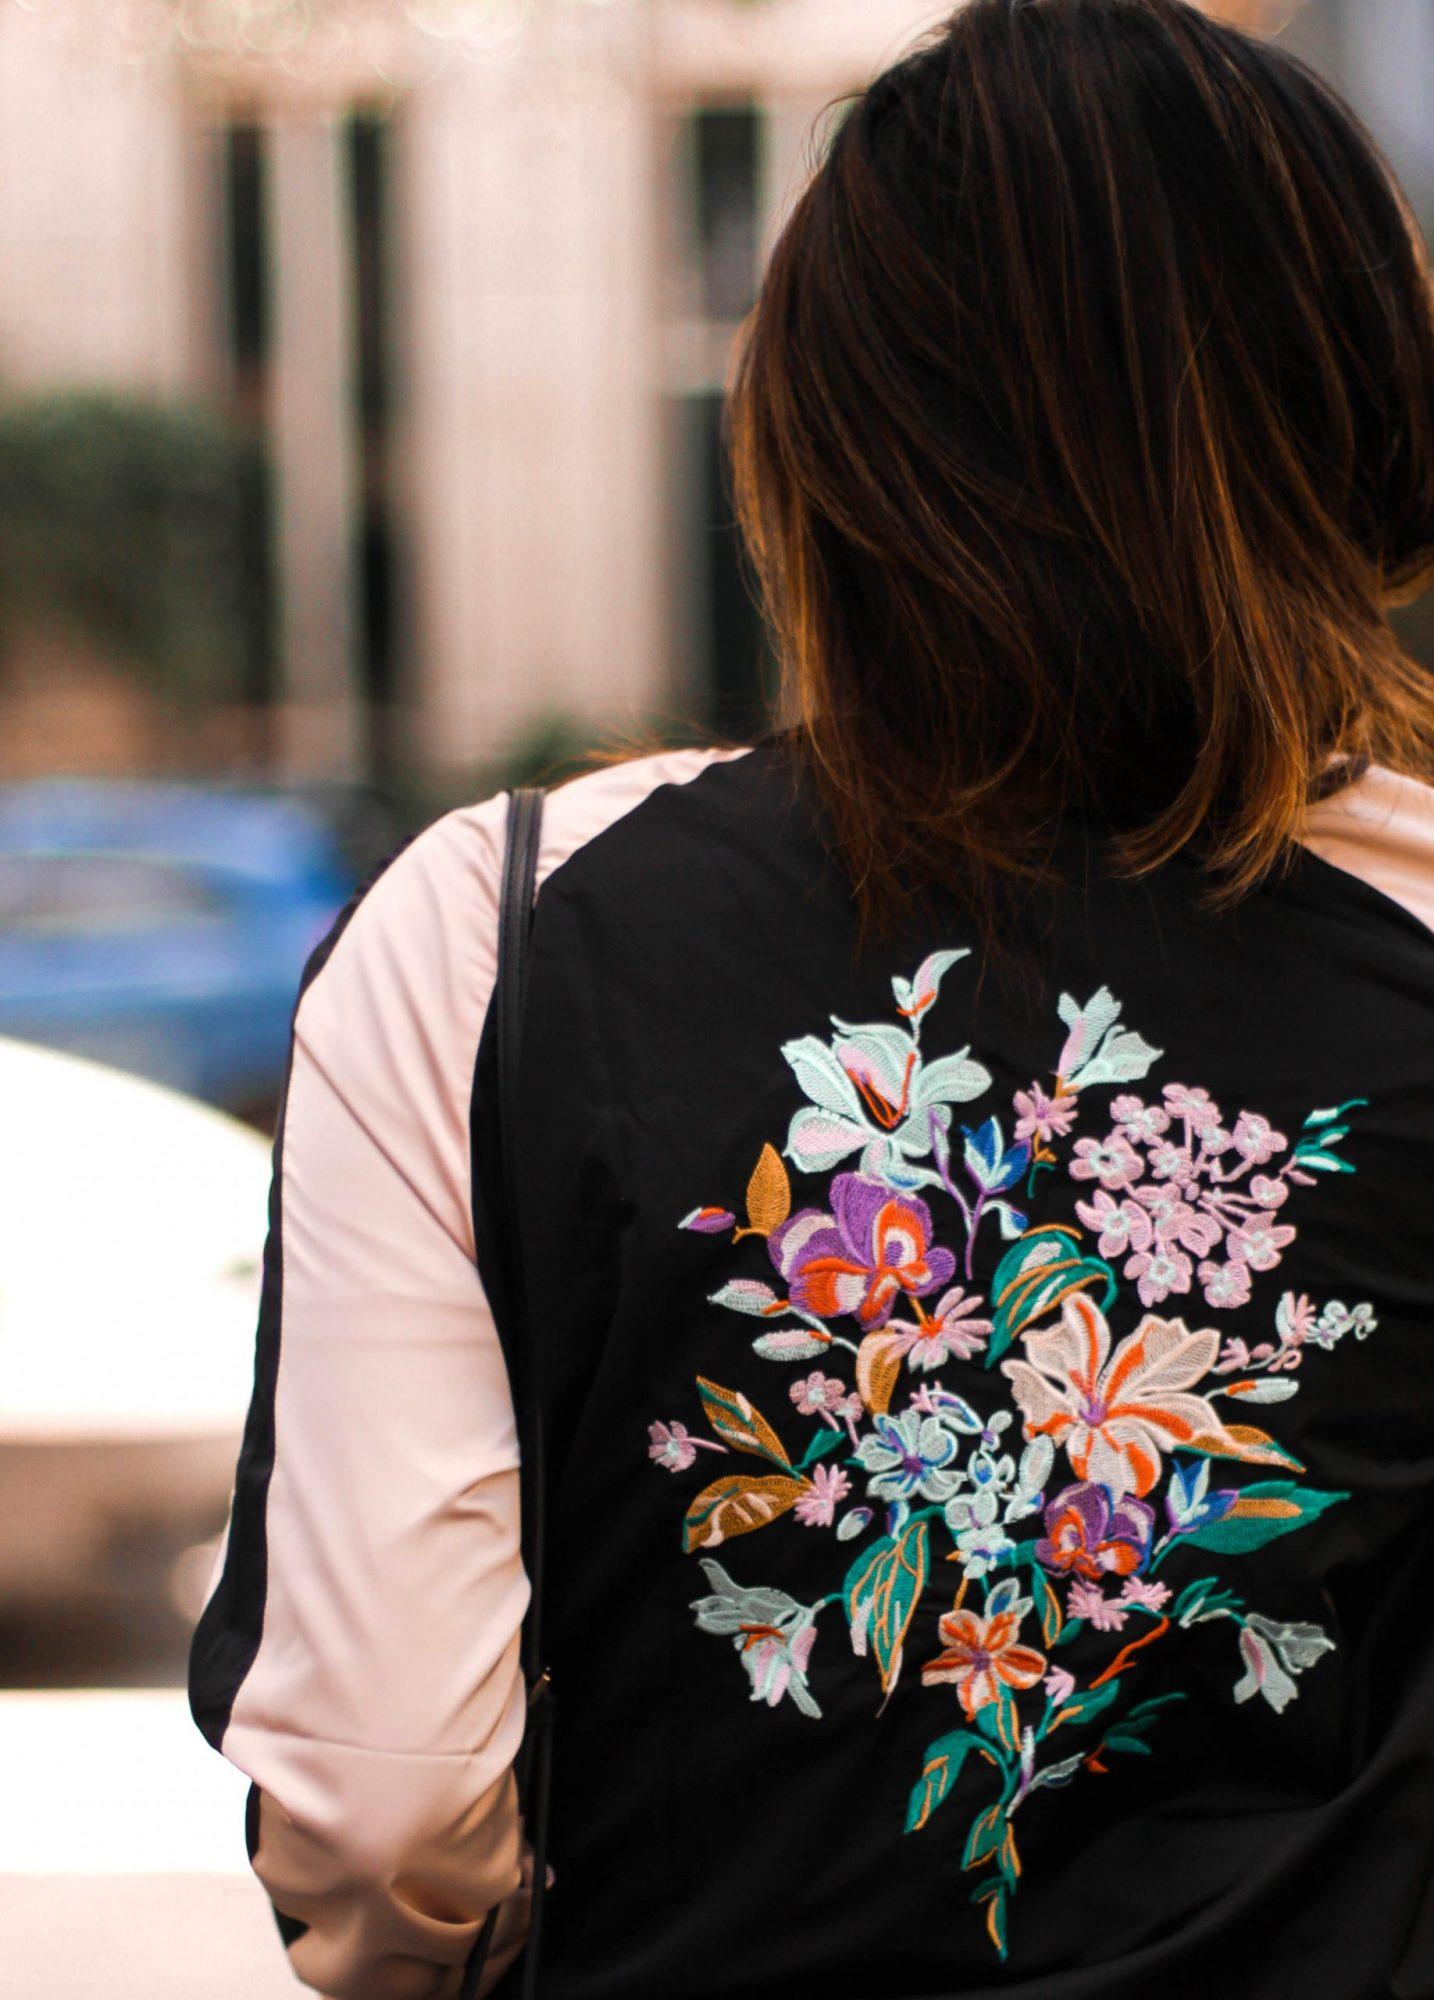 satin-floral-pinkbomber-jacket-detail